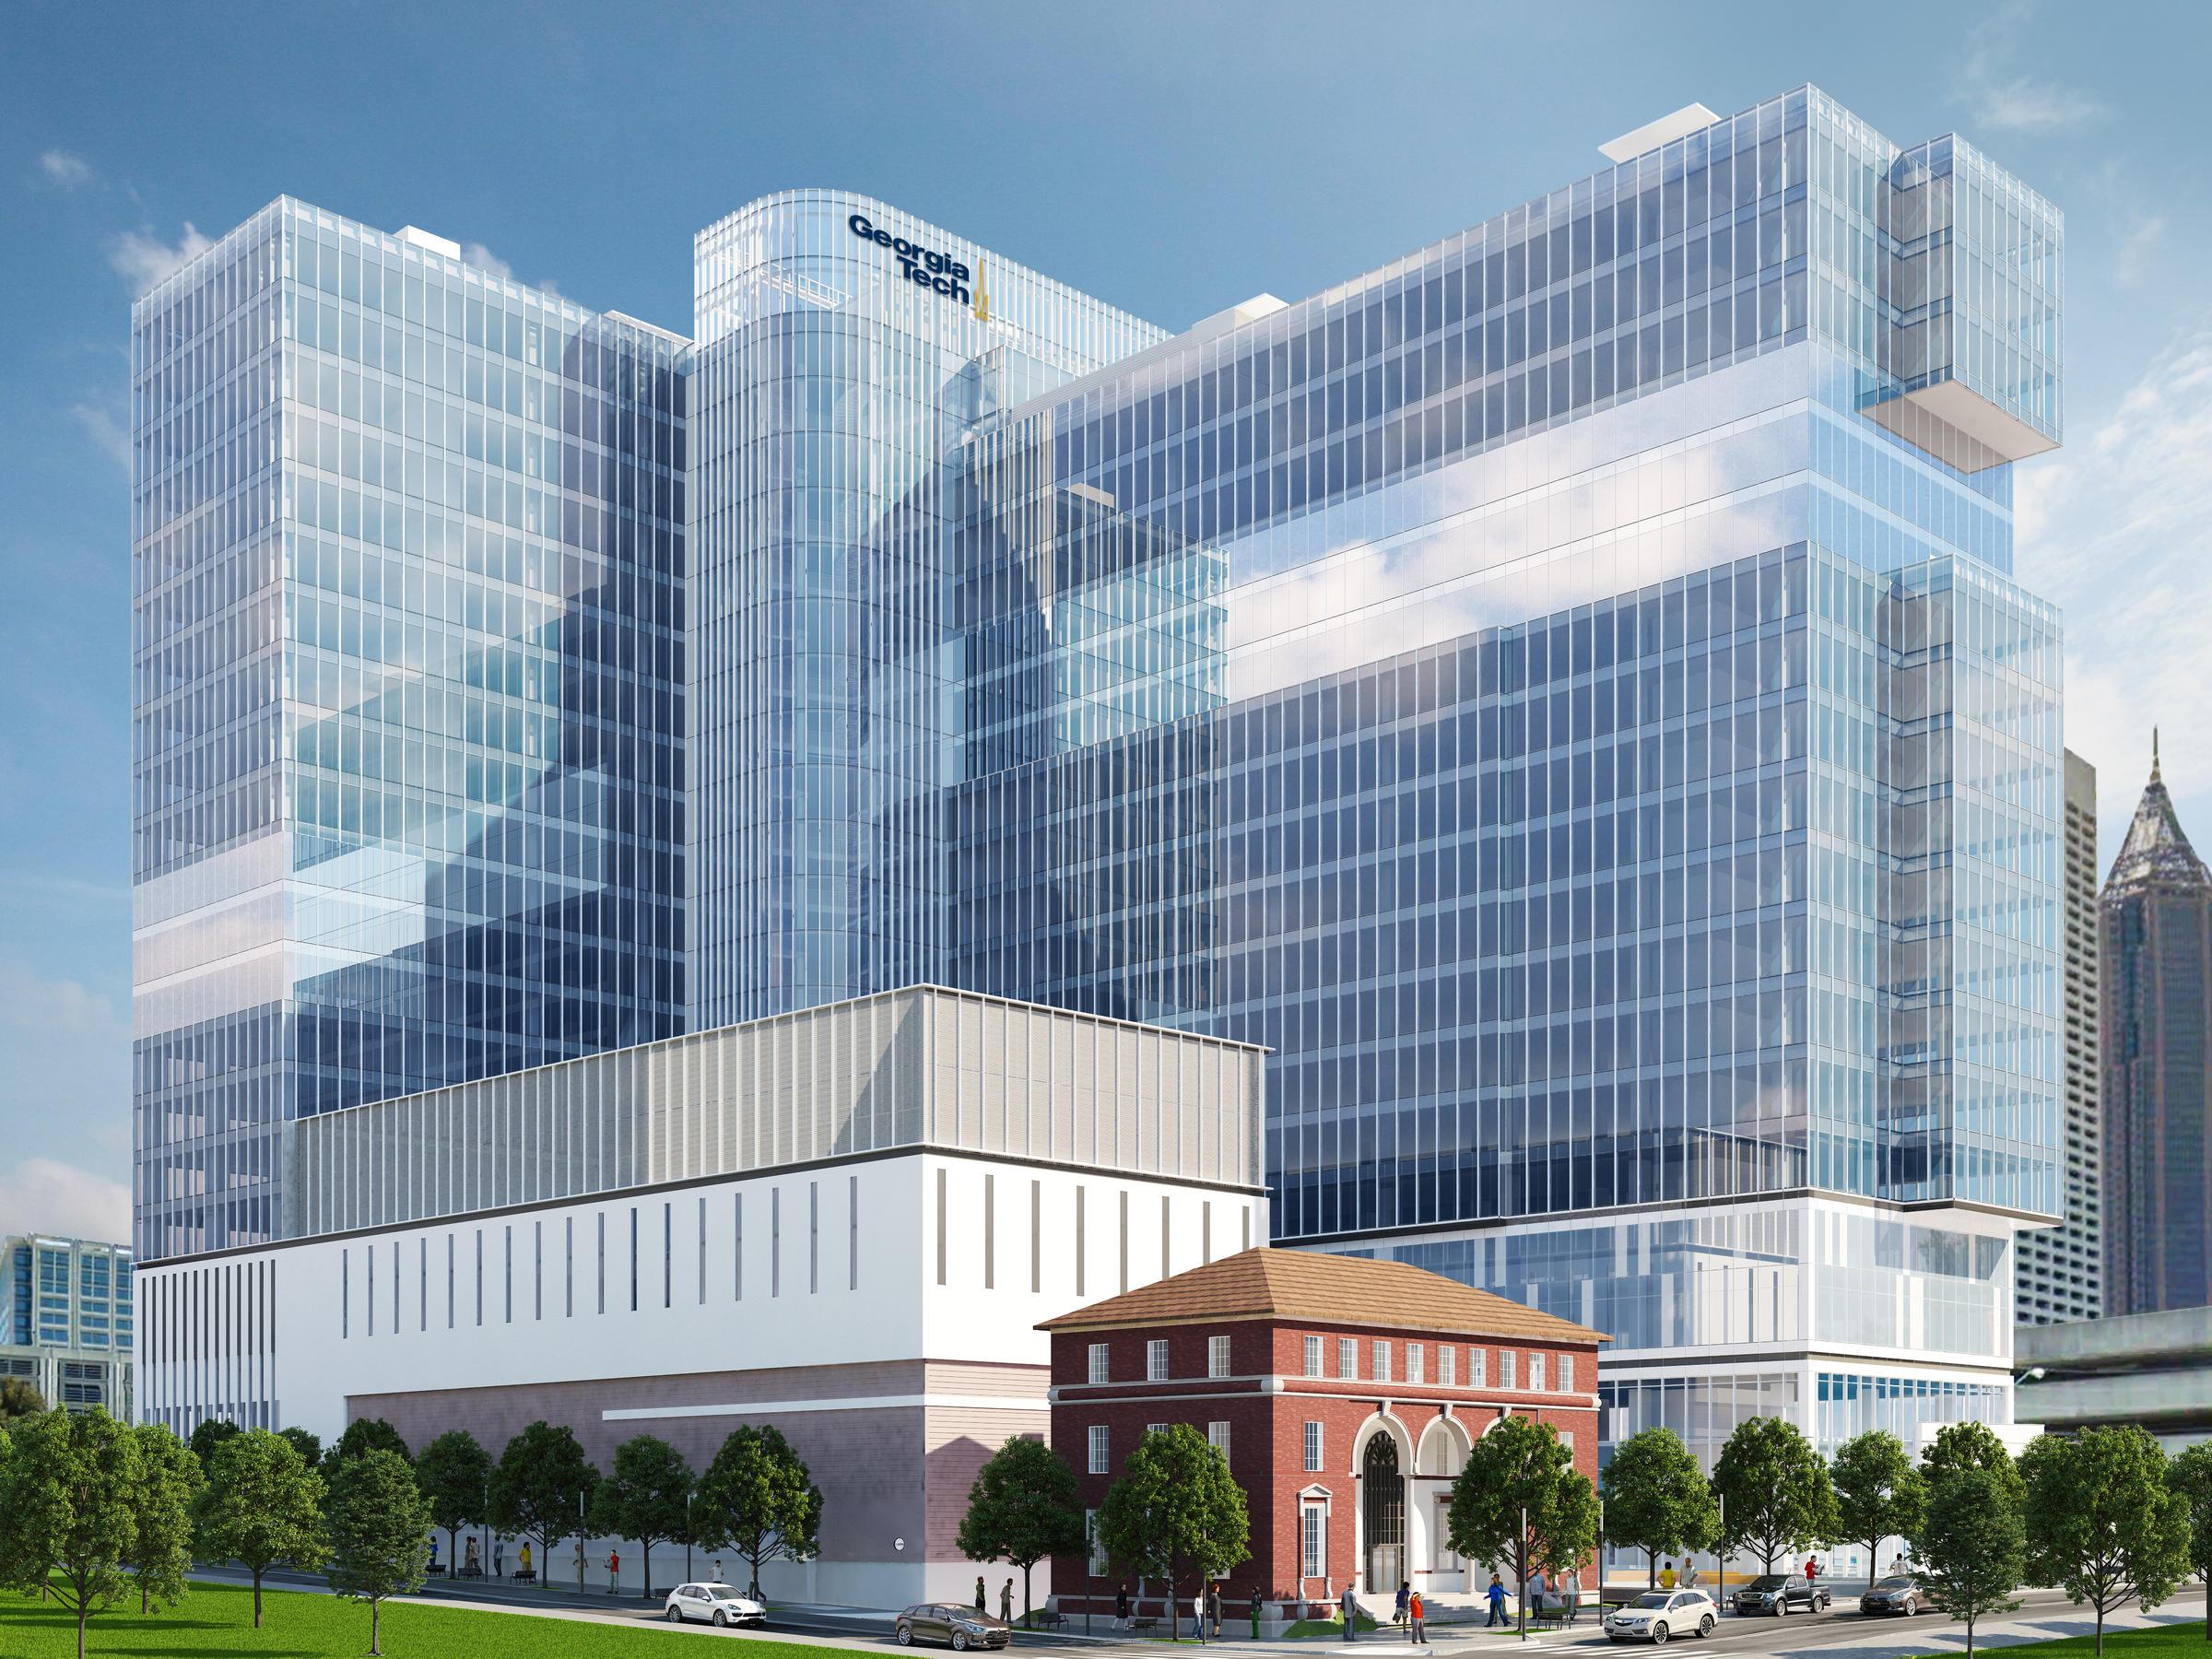 Georgia Tech 39 S Planned Data Center Has Futuristic Design